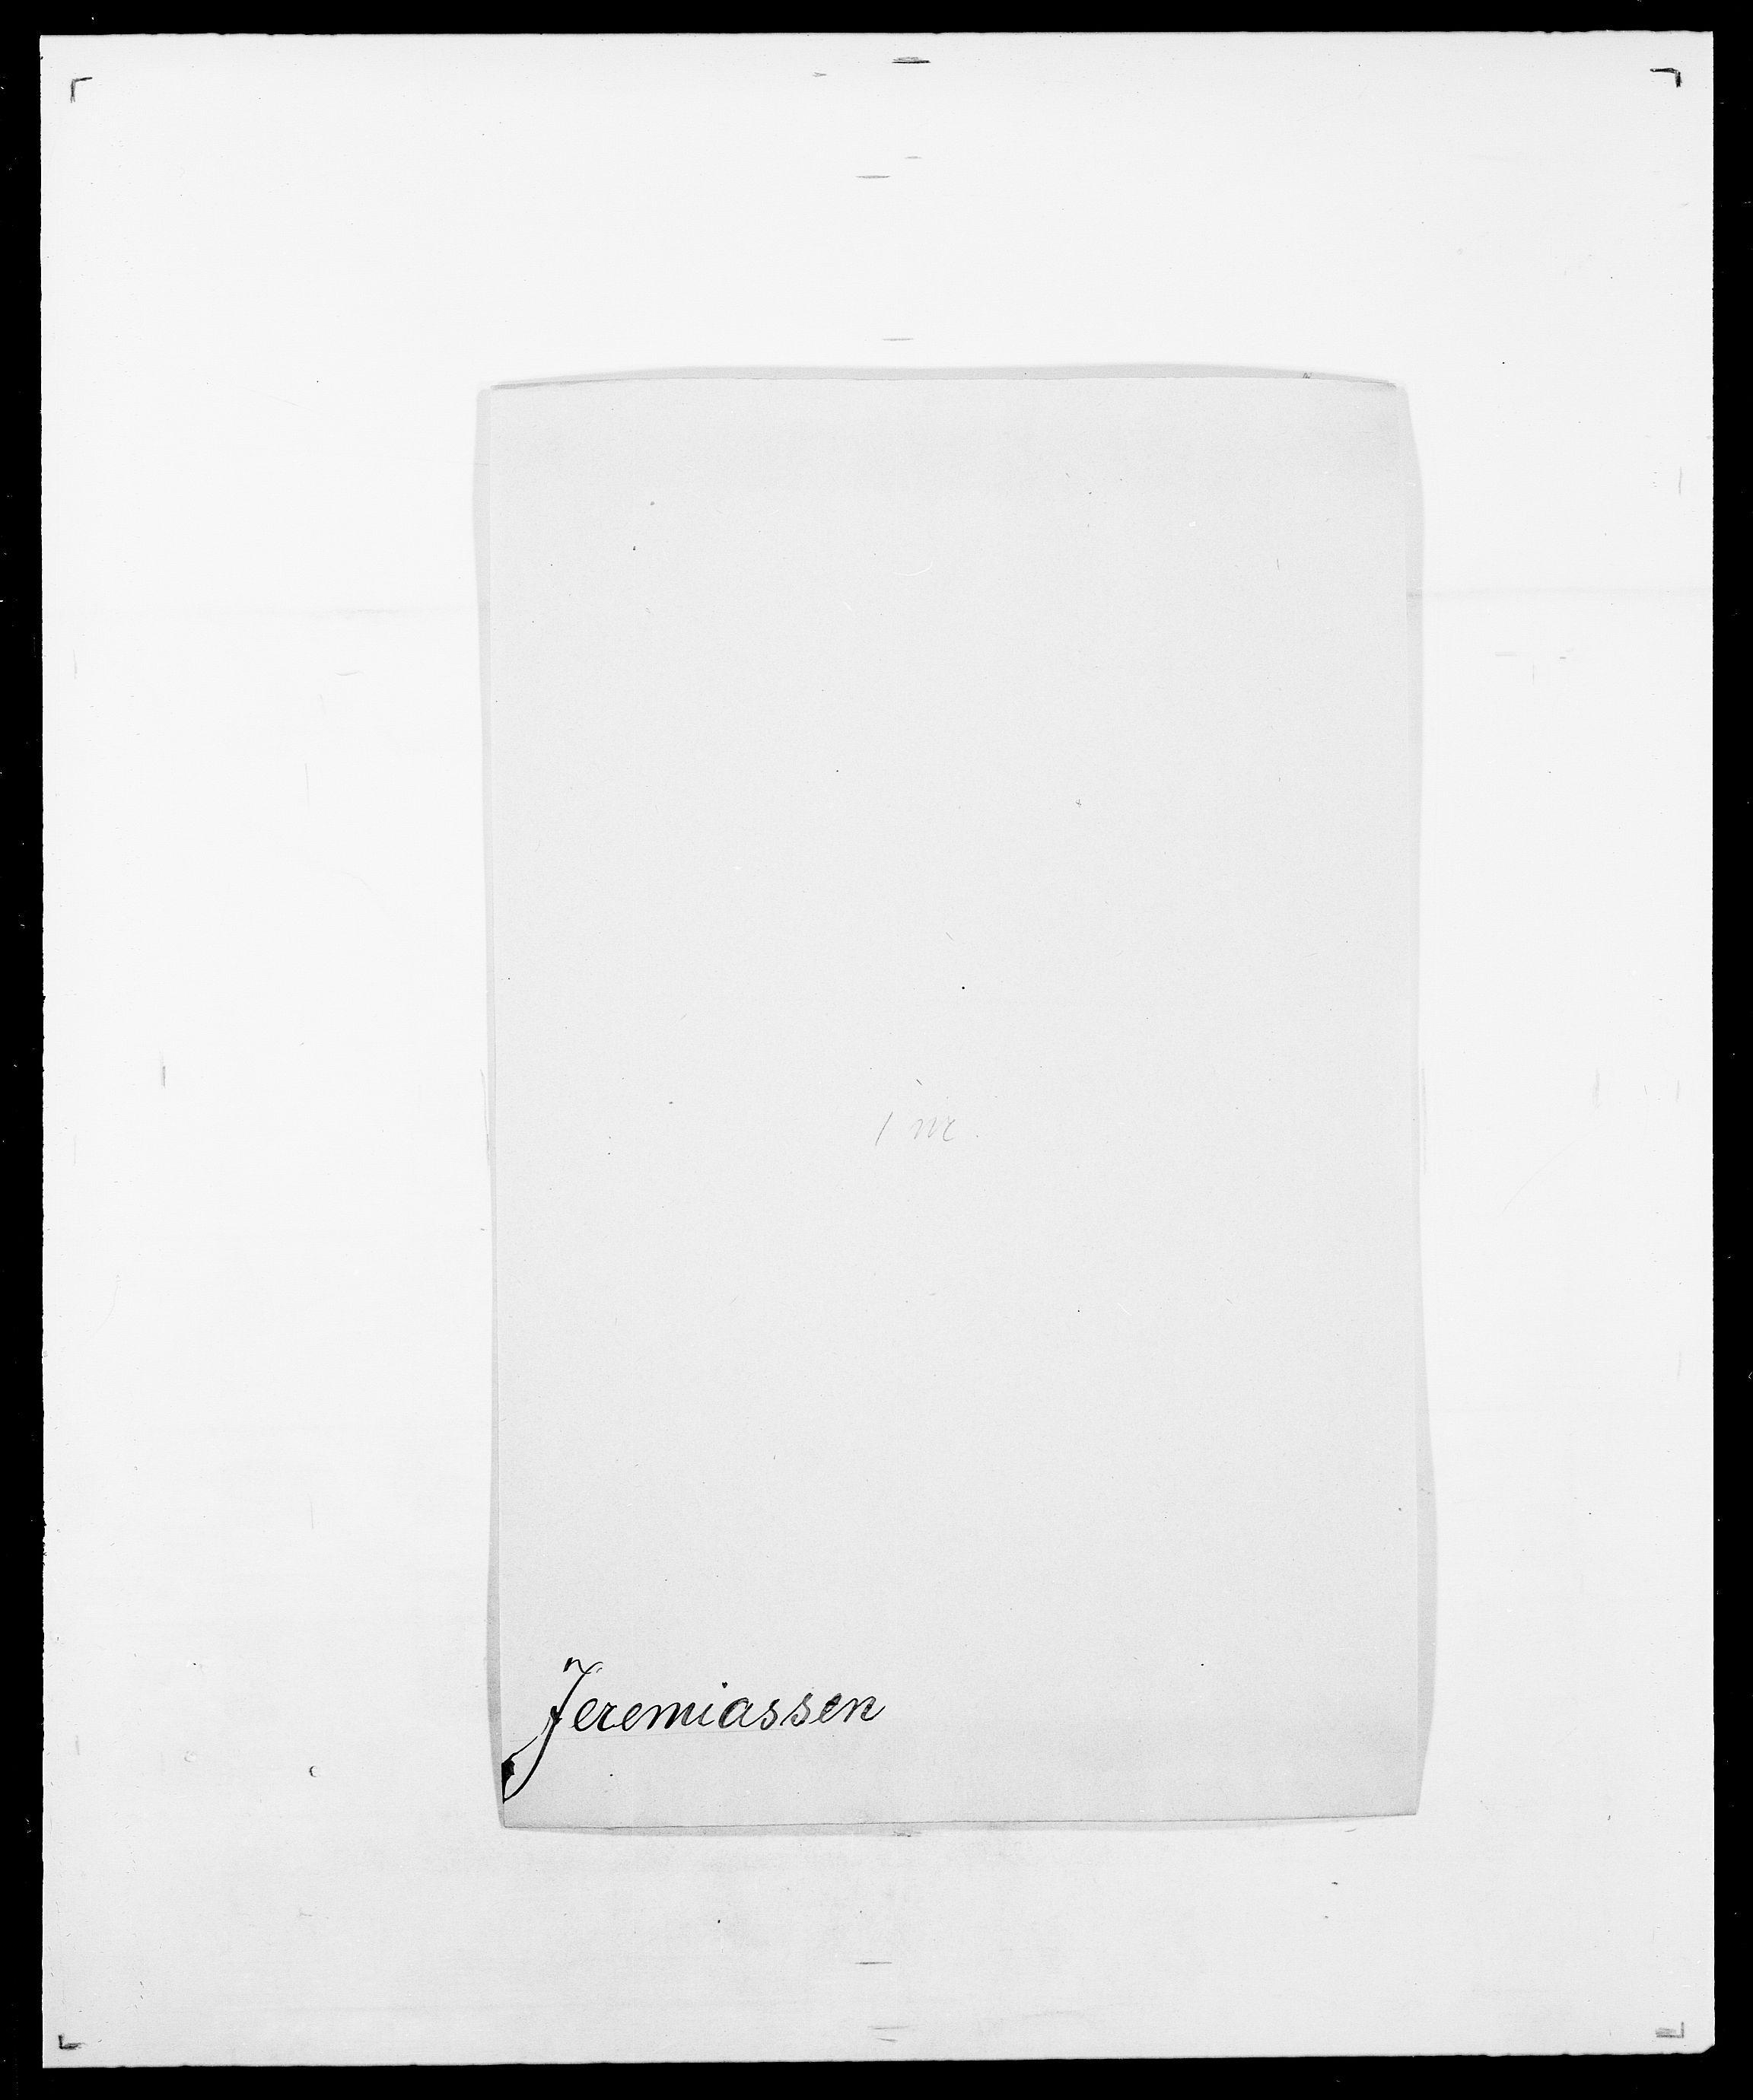 SAO, Delgobe, Charles Antoine - samling, D/Da/L0019: van der Hude - Joys, s. 698